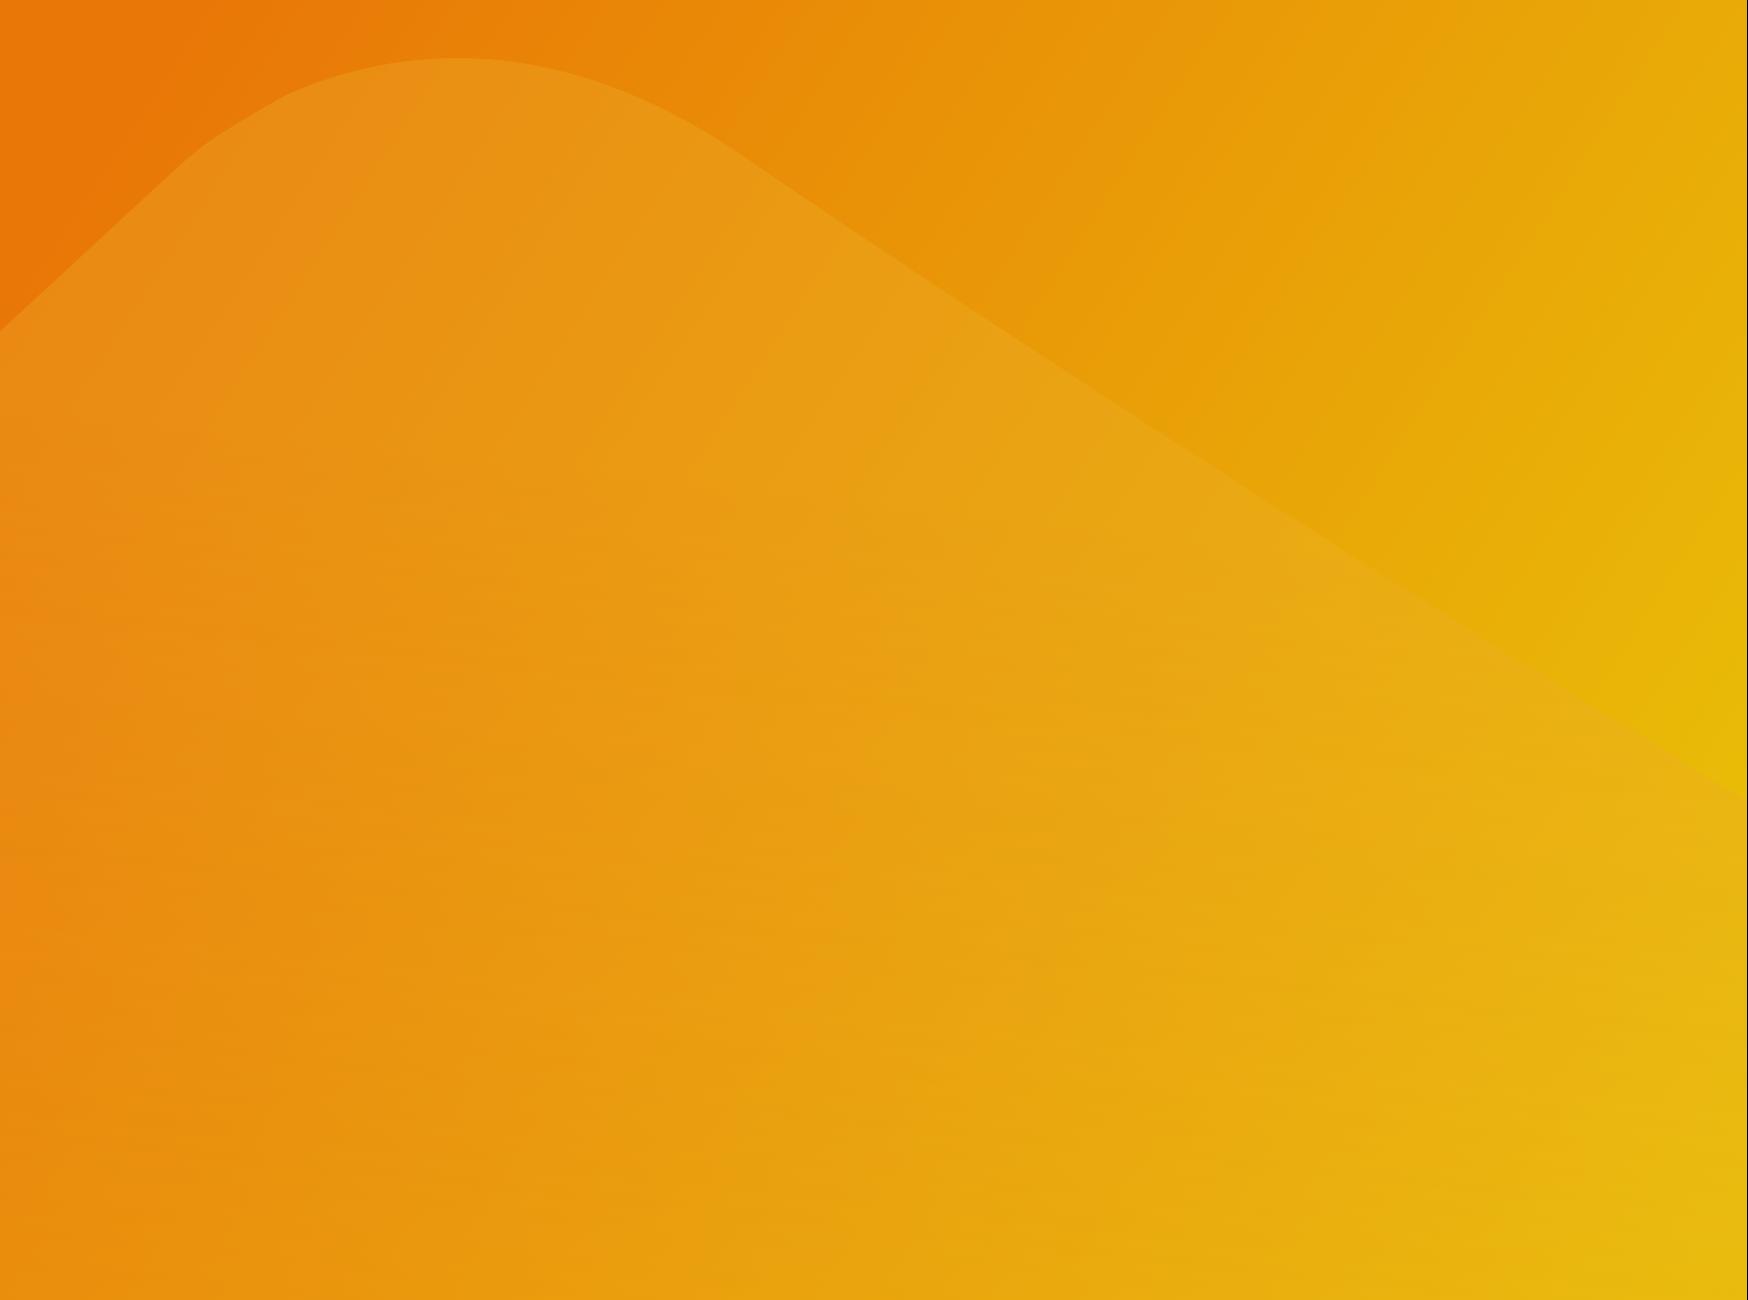 Background Image - Orange Gradient